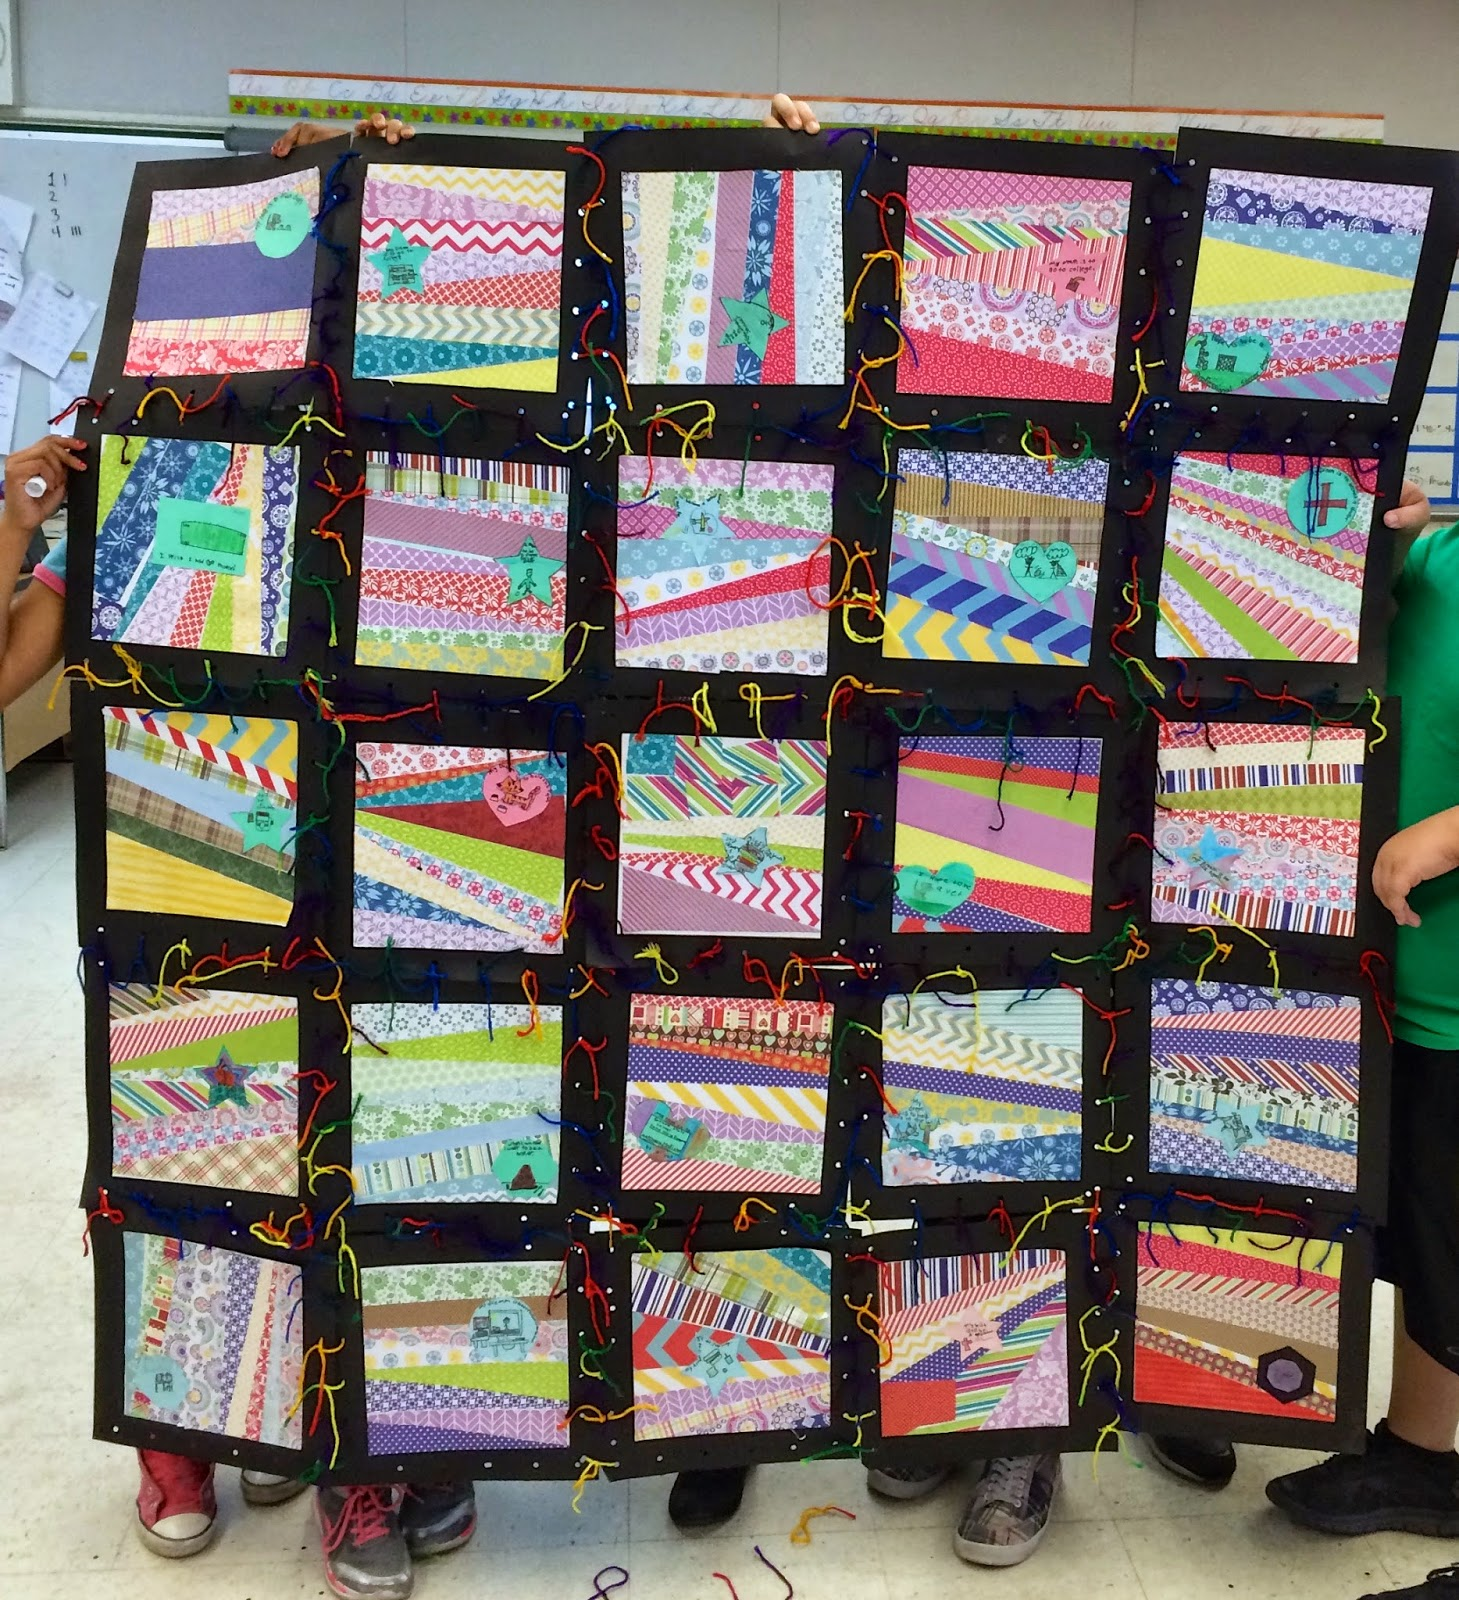 Kathy's AngelNik Designs & Art Project Ideas: Unconventional Wish ... : classroom quilt ideas - Adamdwight.com